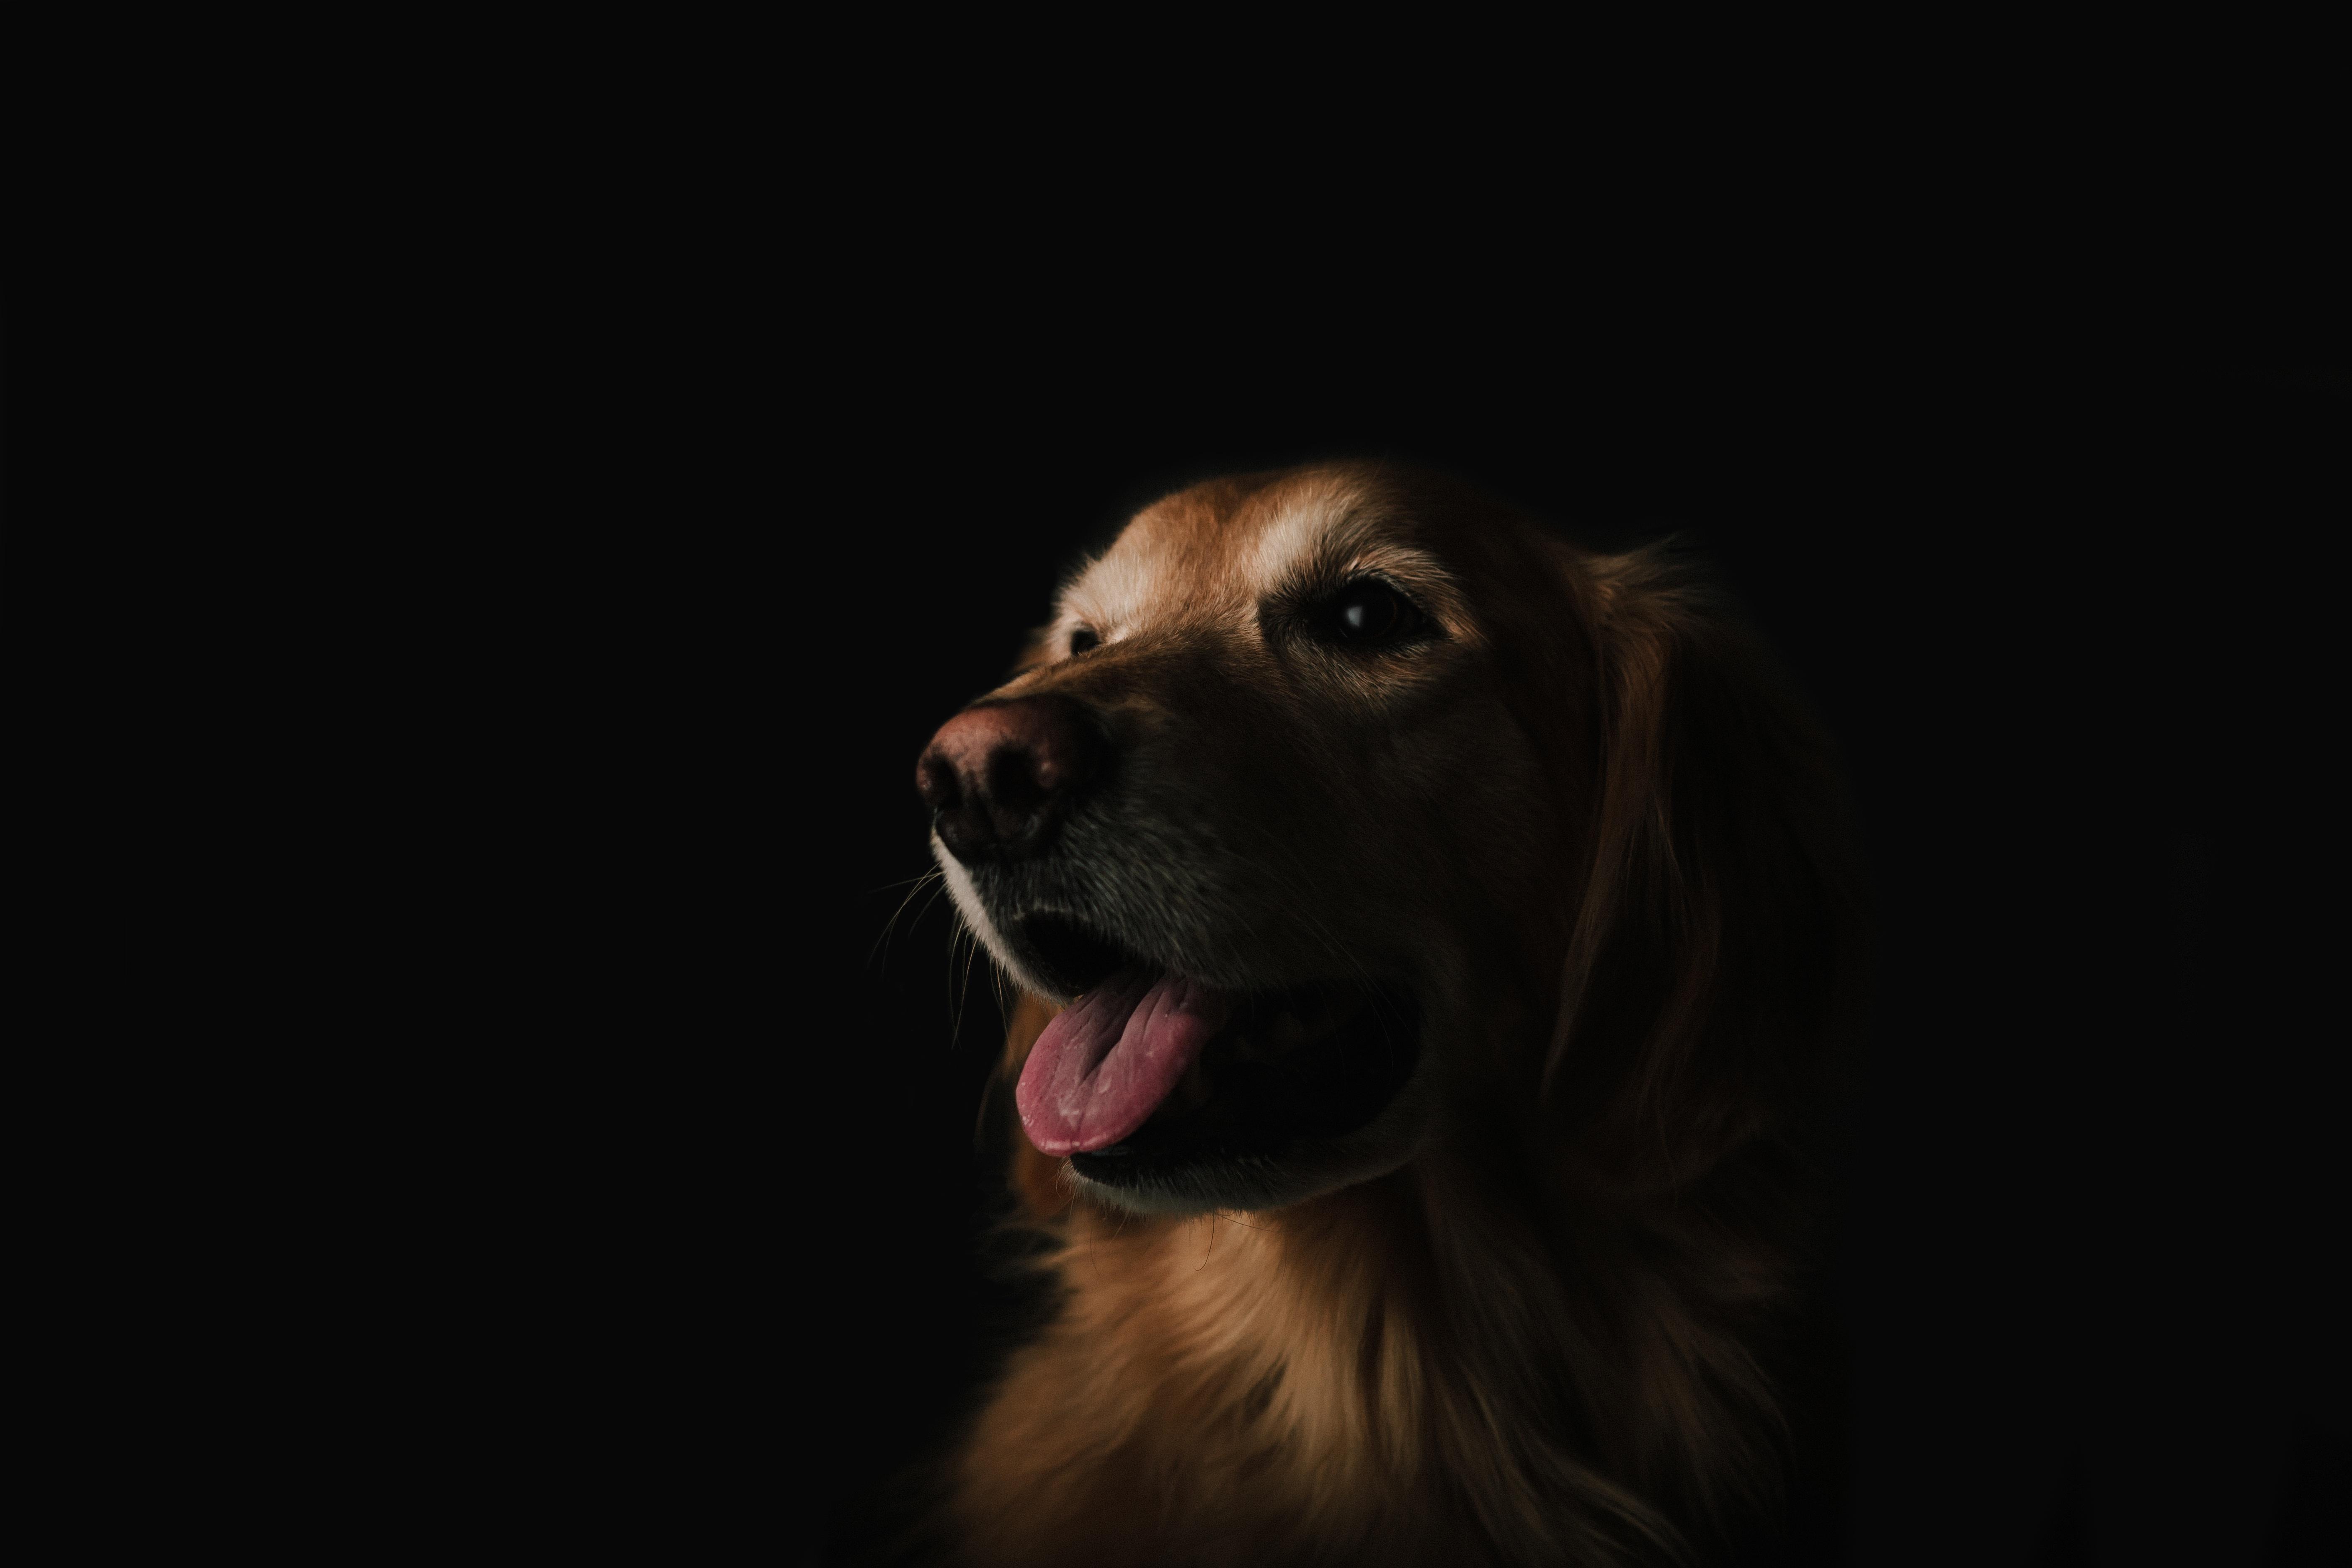 Pet, Train, Order, Friend, Dog, HQ Photo